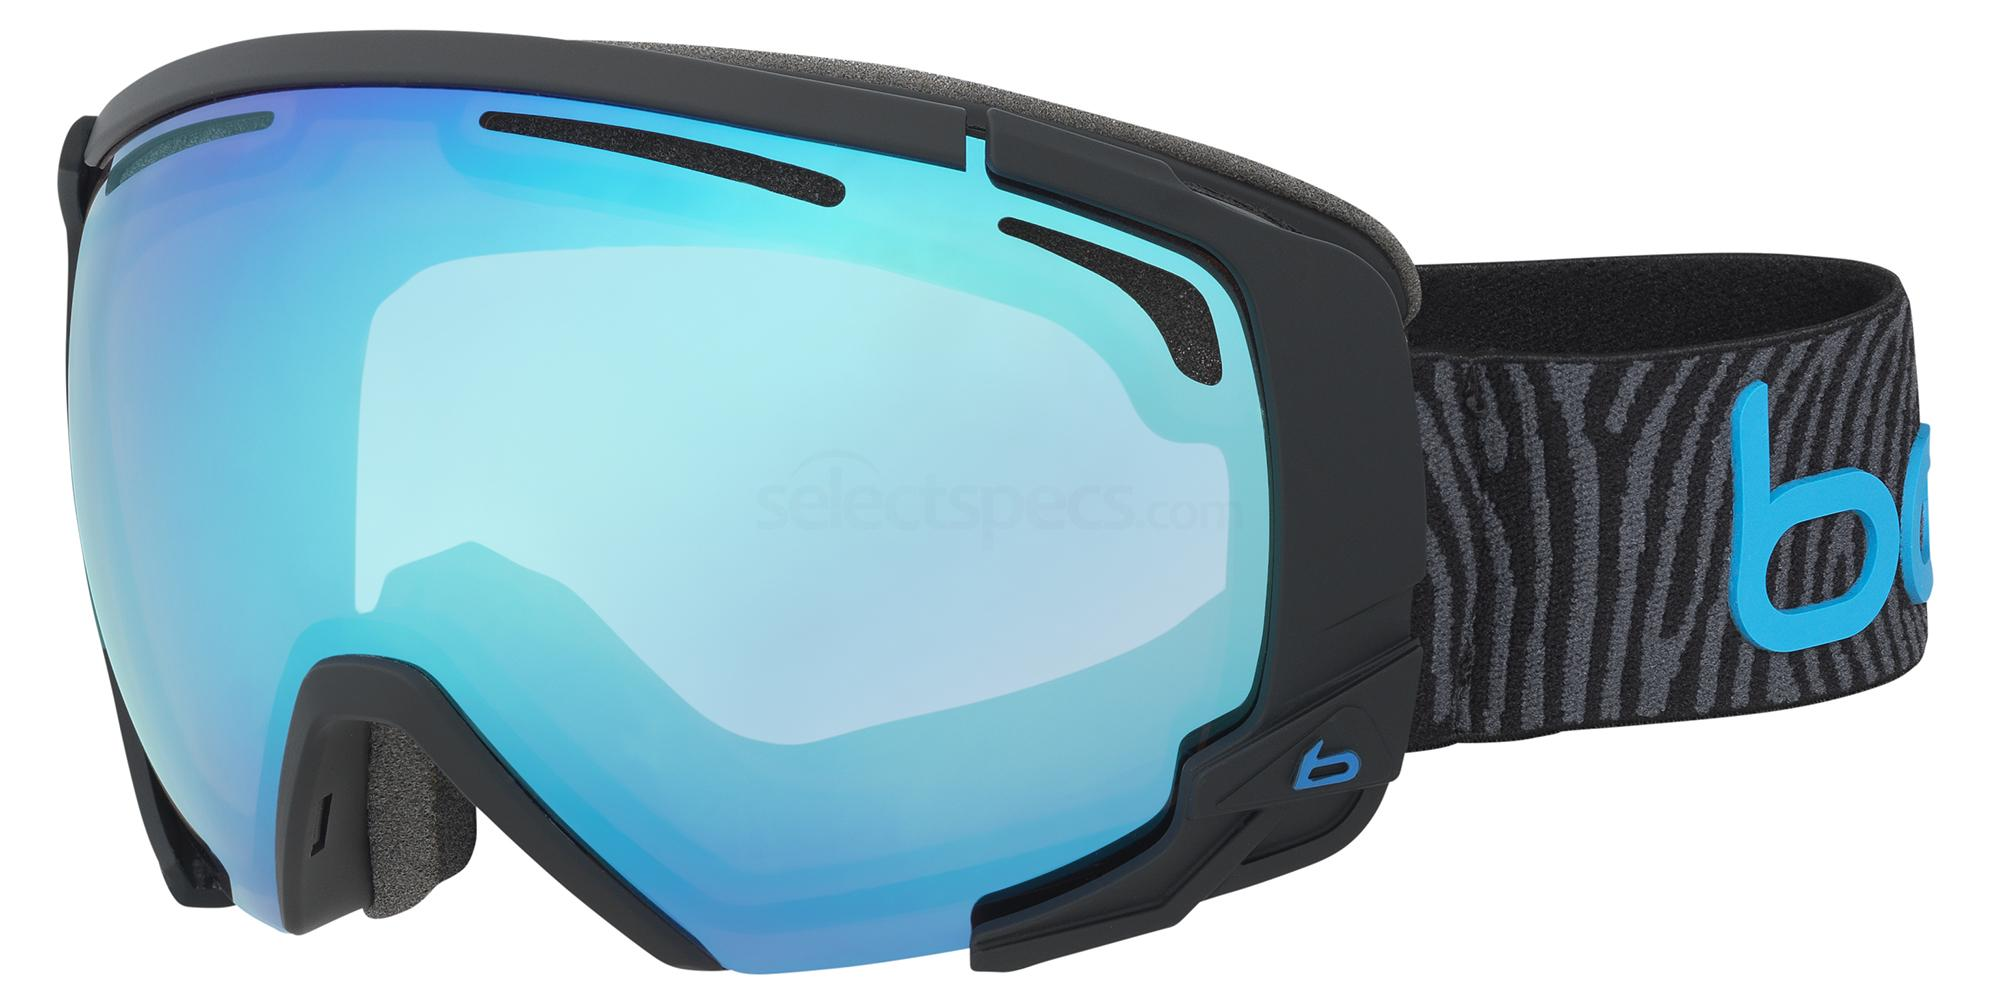 21610 SUPREME OTG Goggles, Bolle